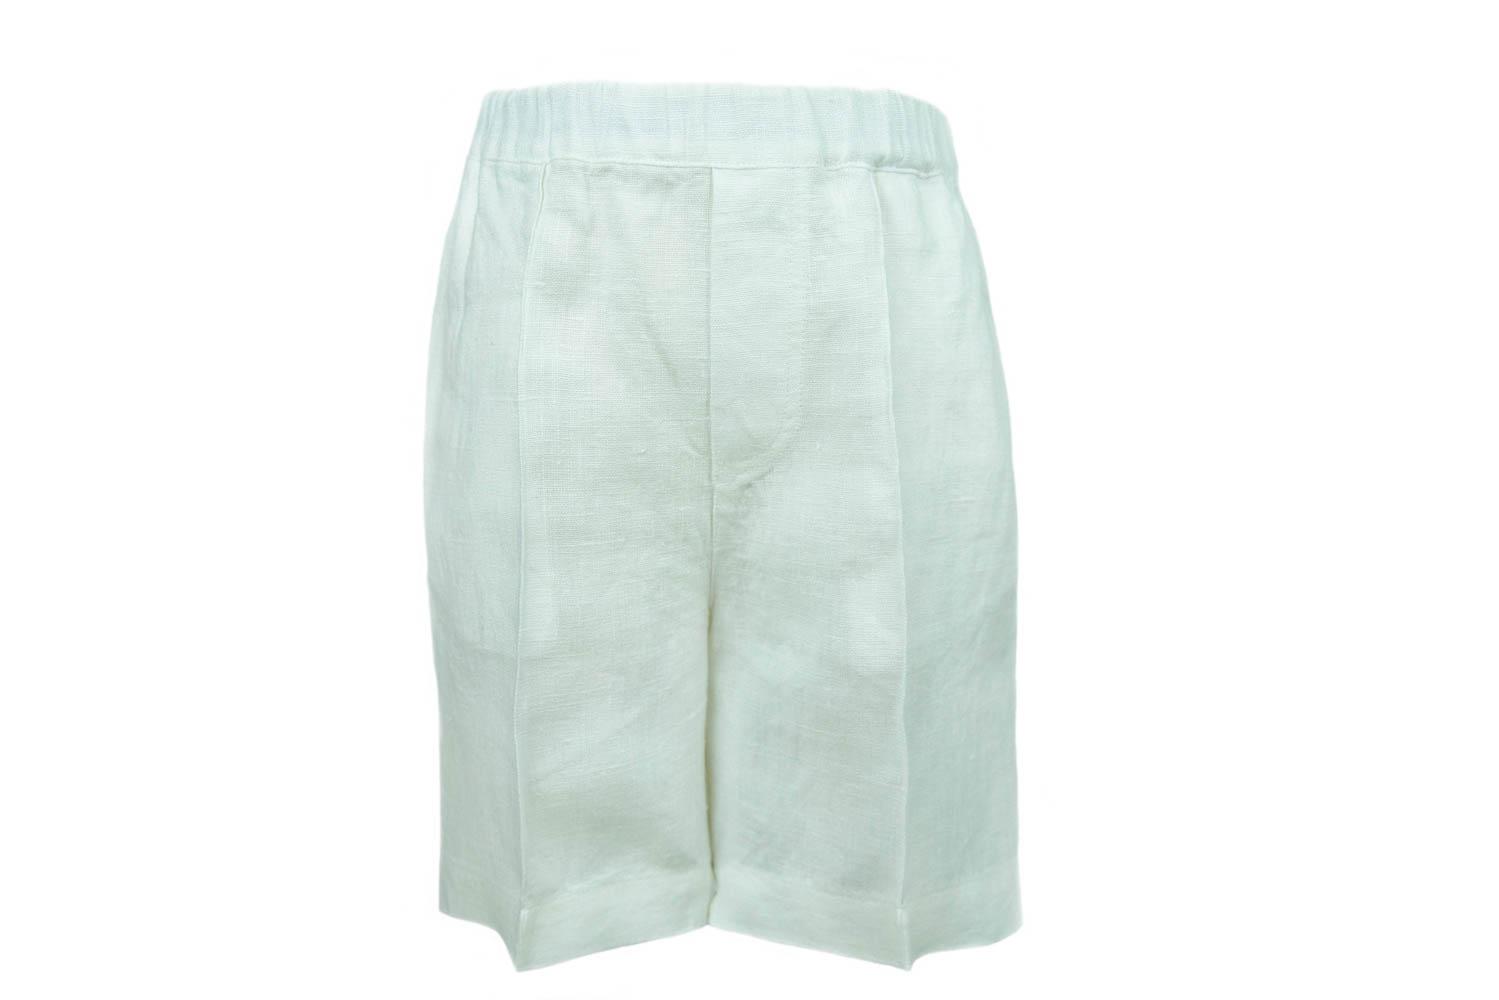 smart_alek-white-tailored_shorts-01.jpg